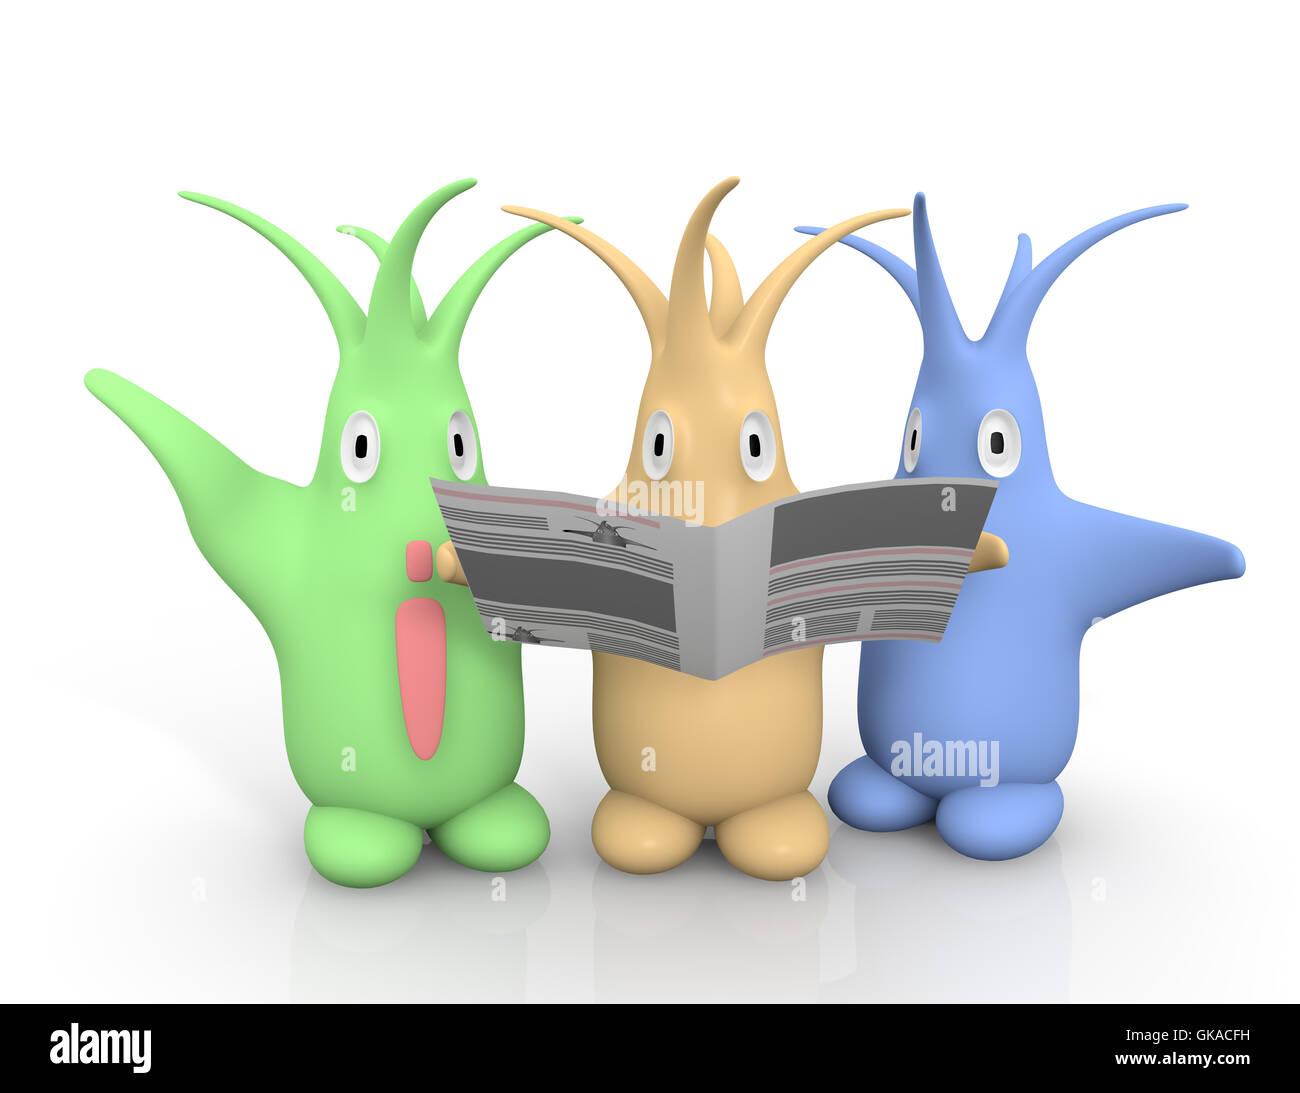 floopi newspaper - Stock Image